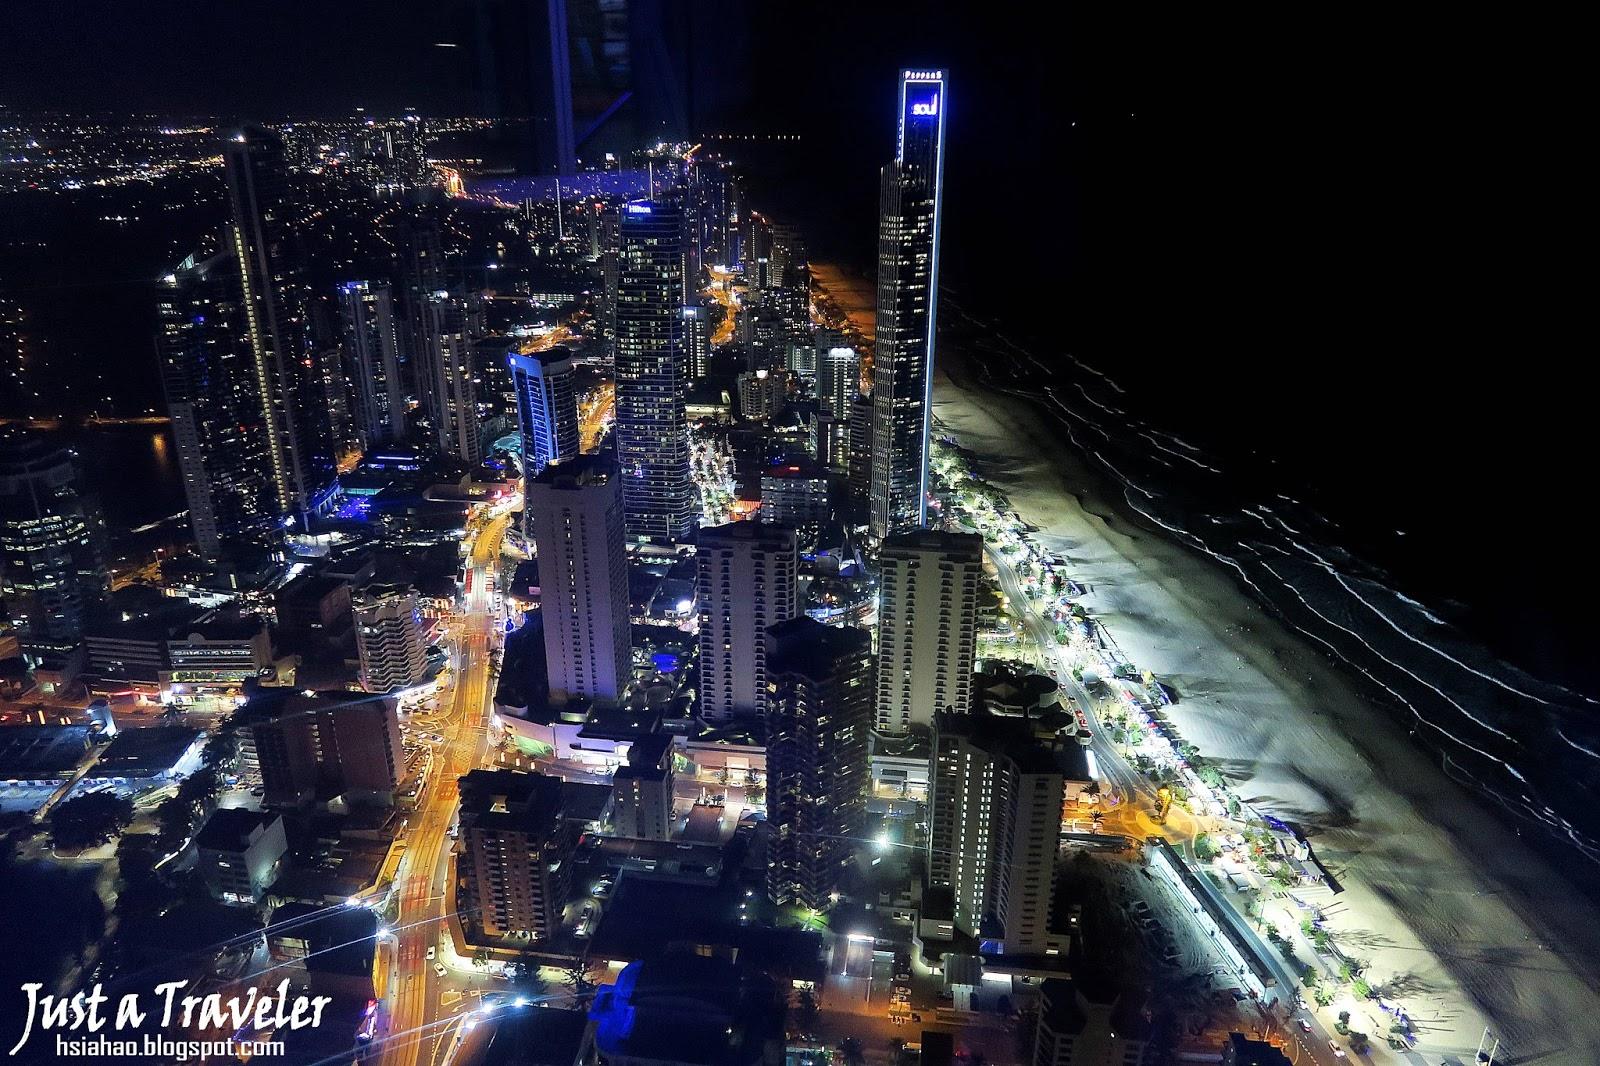 黃金海岸-夜景-景點-推薦-Q1-Skypoint-觀景台-Gold-Coast-Attraction-Observatory-deck-Tourist-destination